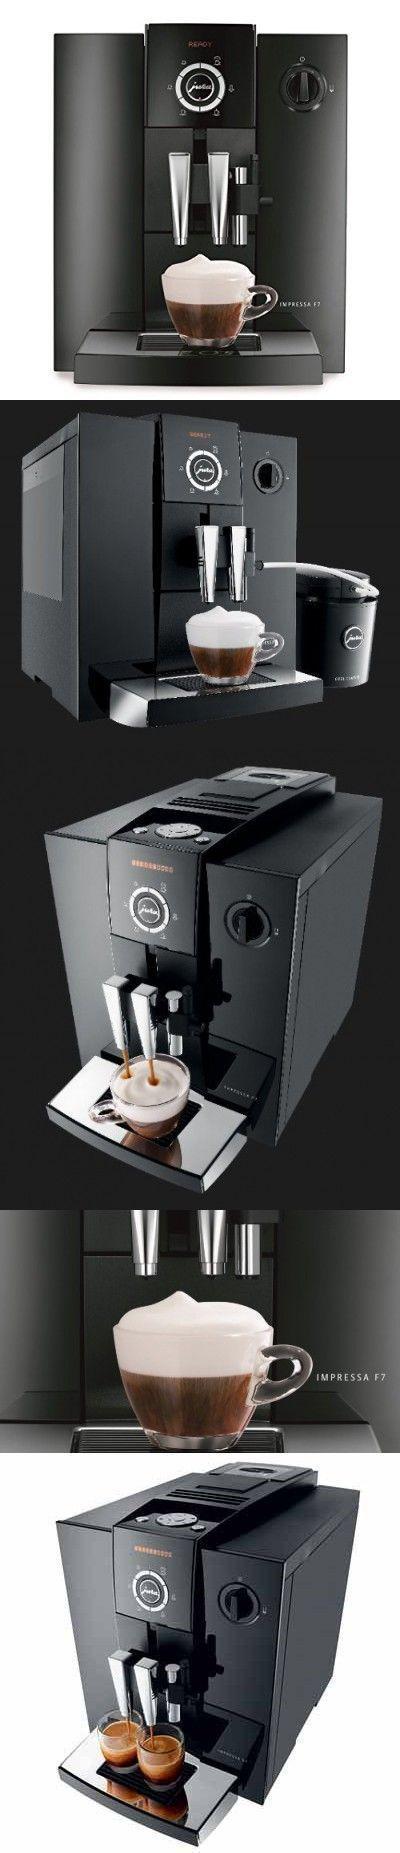 Jura Impressa F7 Automatic Coffee Center (Certified Refurbished) #juraimpressa Jura Impressa F7 Automatic Coffee Center (Certified Refurbished) #juraimpressa Jura Impressa F7 Automatic Coffee Center (Certified Refurbished) #juraimpressa Jura Impressa F7 Automatic Coffee Center (Certified Refurbished) #juraimpressa Jura Impressa F7 Automatic Coffee Center (Certified Refurbished) #juraimpressa Jura Impressa F7 Automatic Coffee Center (Certified Refurbished) #juraimpressa Jura Impressa F7 Automatic #juraimpressa